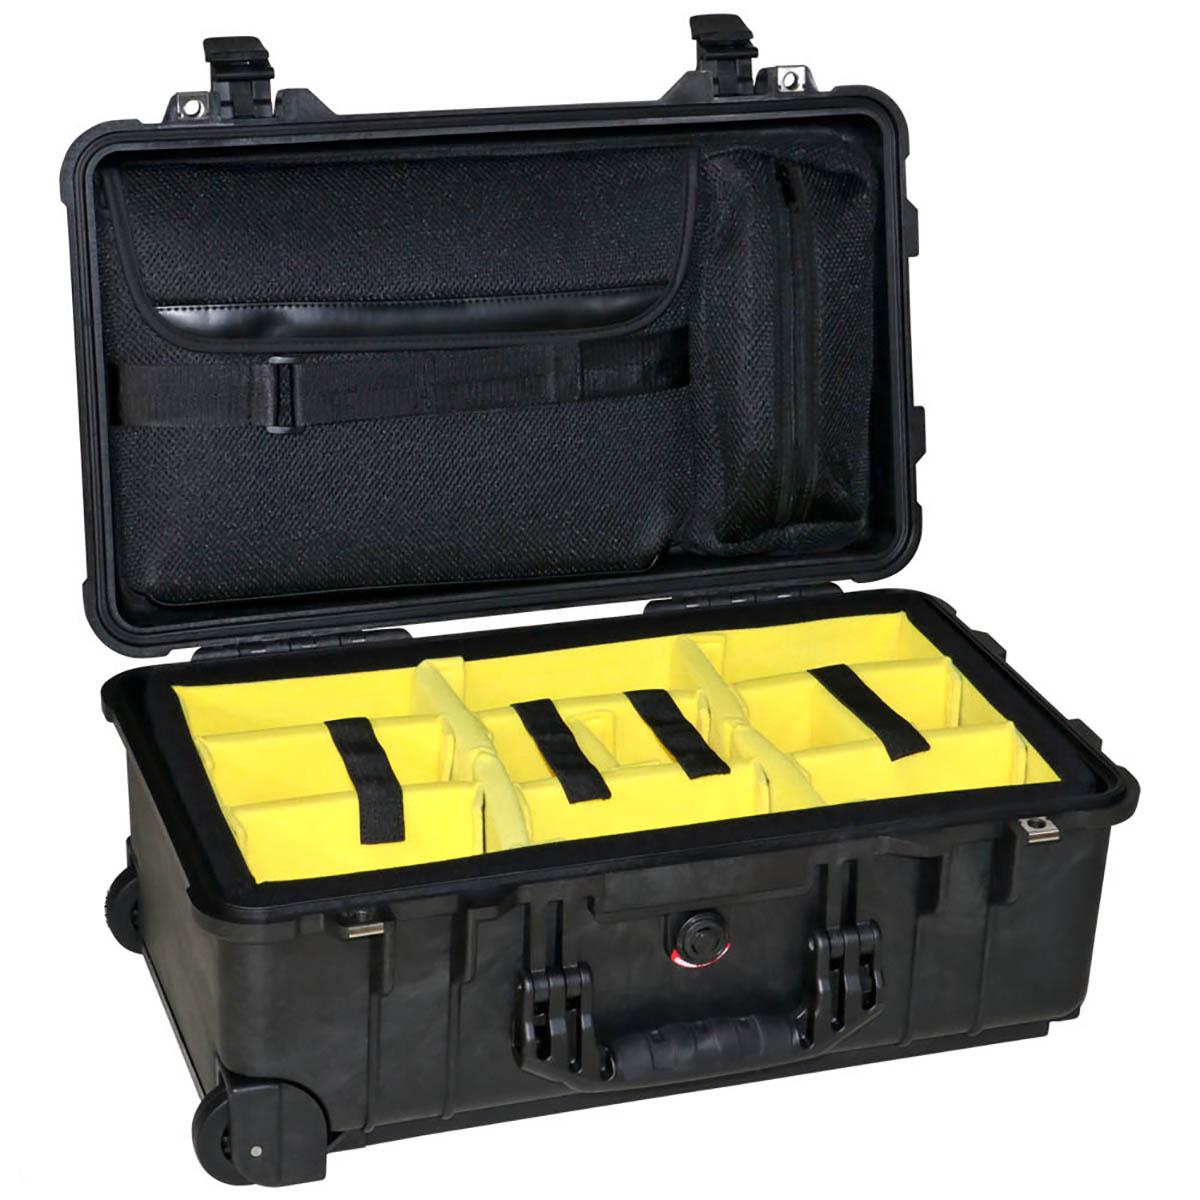 Peli Case 1510 Zwart-Met klittenband vakverdeling en laptophoes in deksel